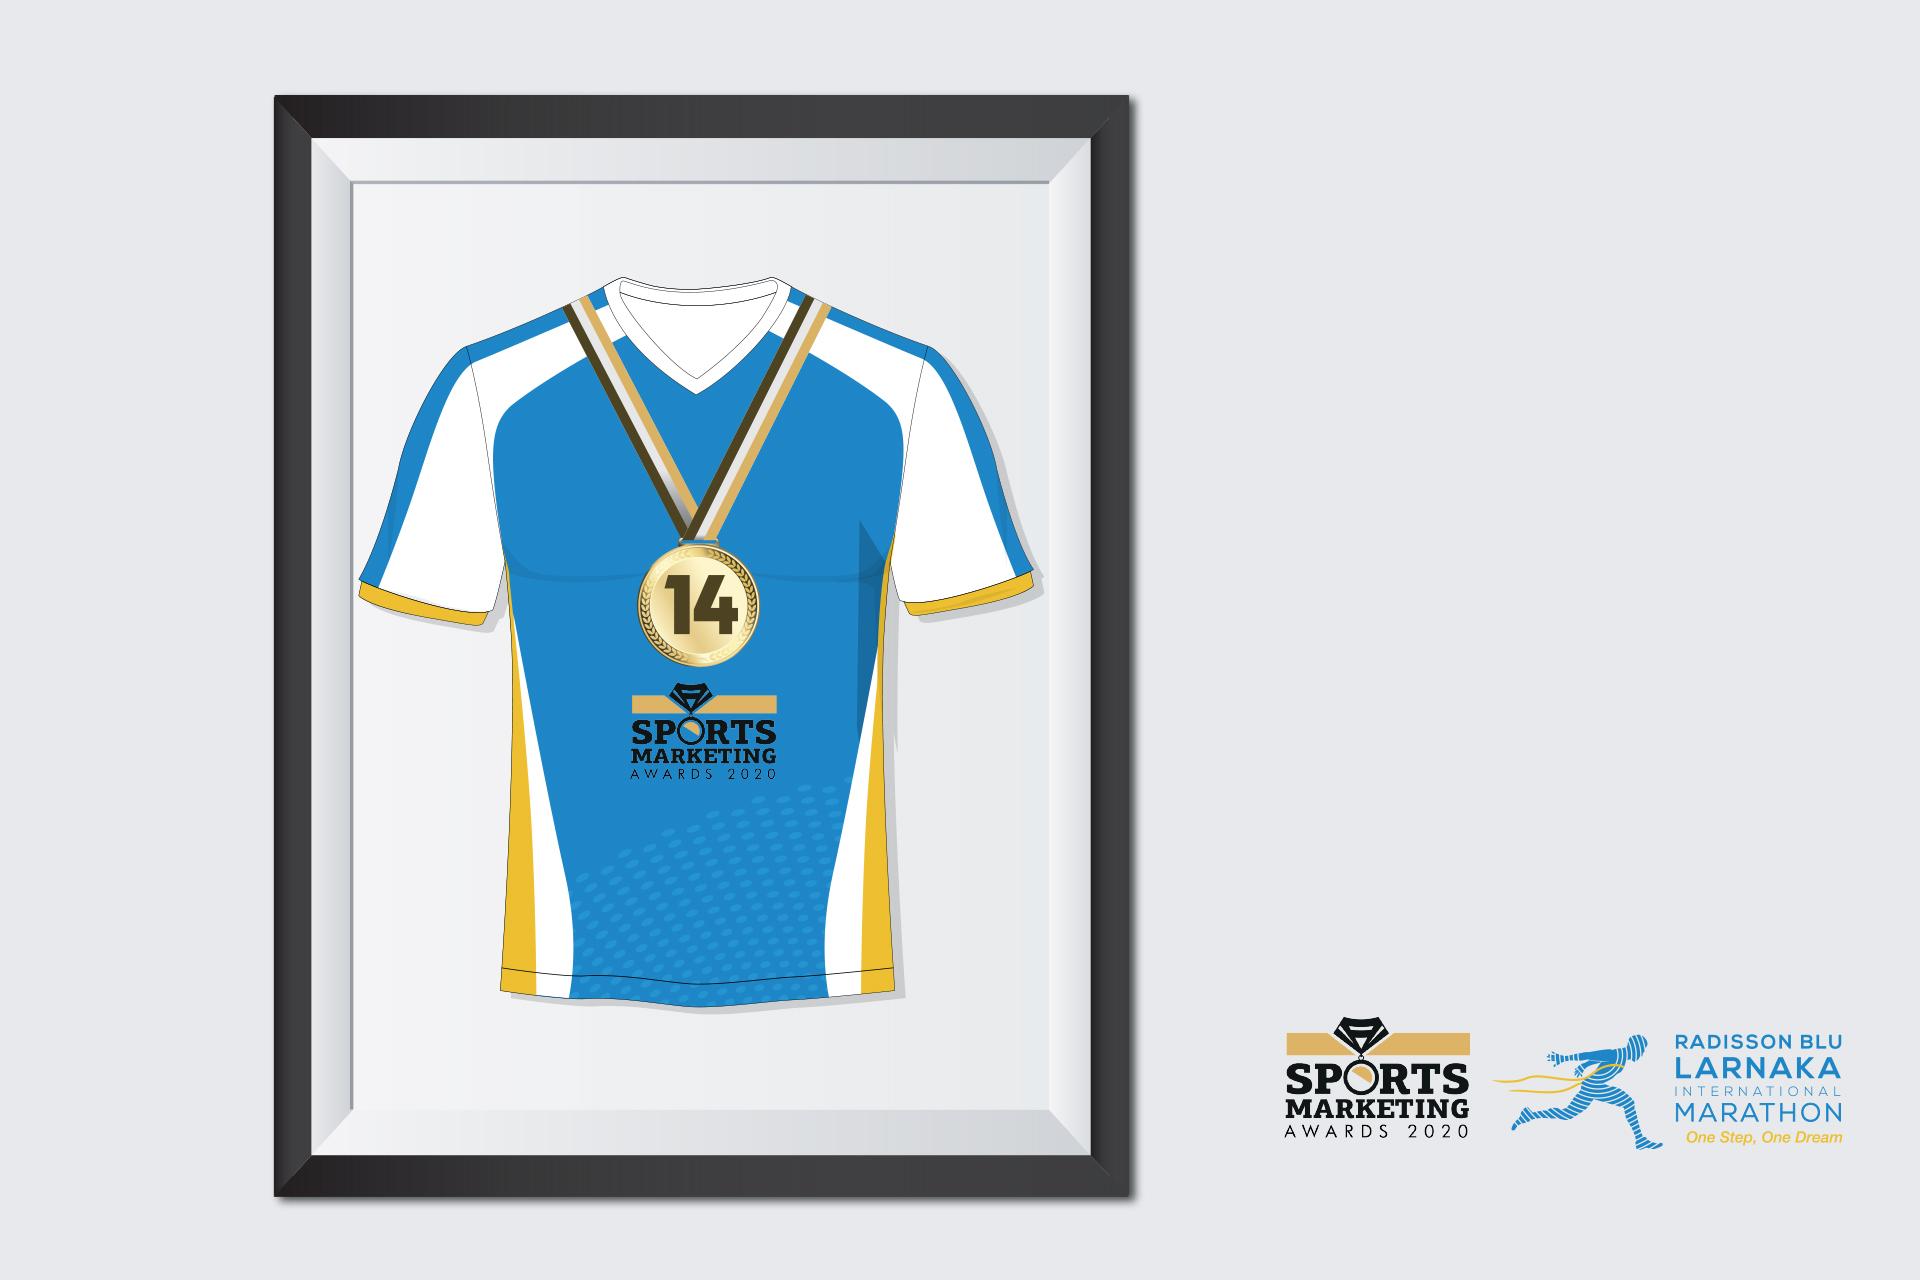 14 awards for the Radisson Blu Larnaka International Marathon at the Sports Marketing Awards 2020